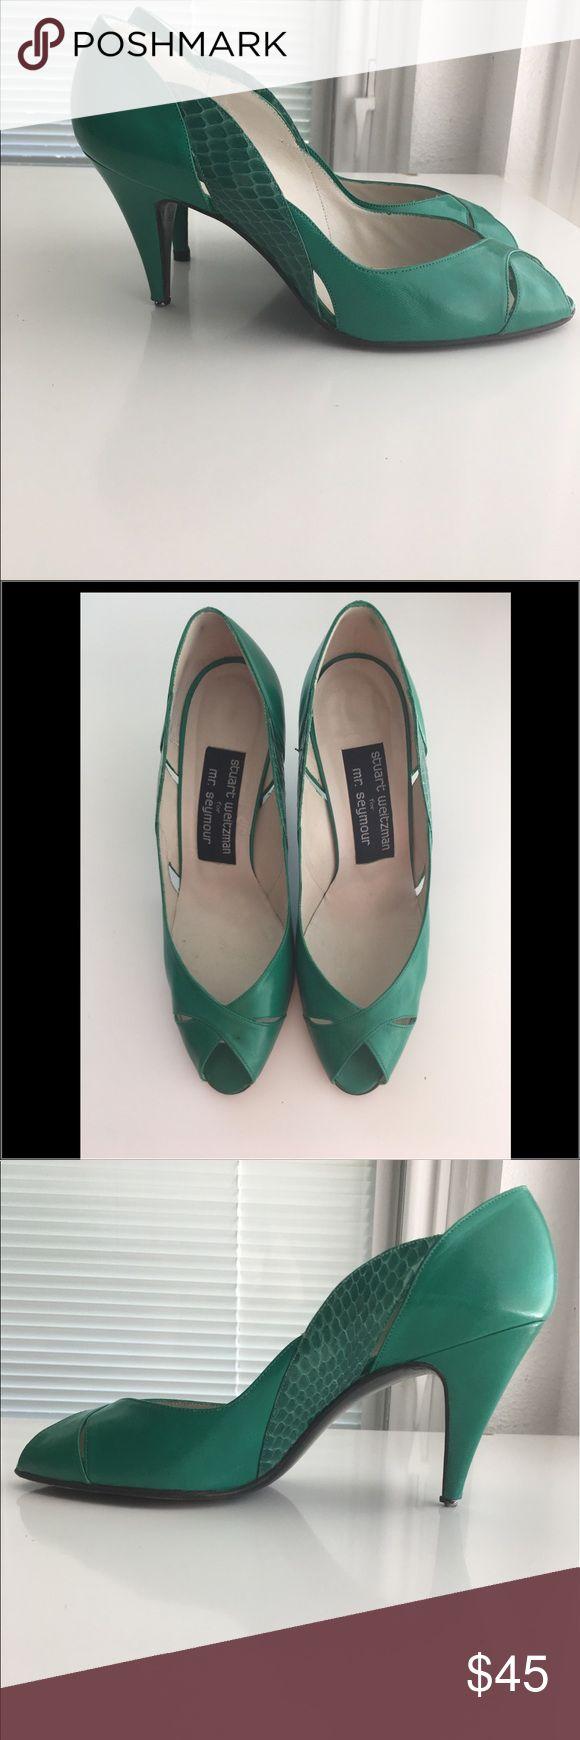 Stuart Weitzman leather Pumps 💚 Snake skin , super cute pumps, excellent condition just need the heel tip fix. Stuart Weitzman Shoes Heels